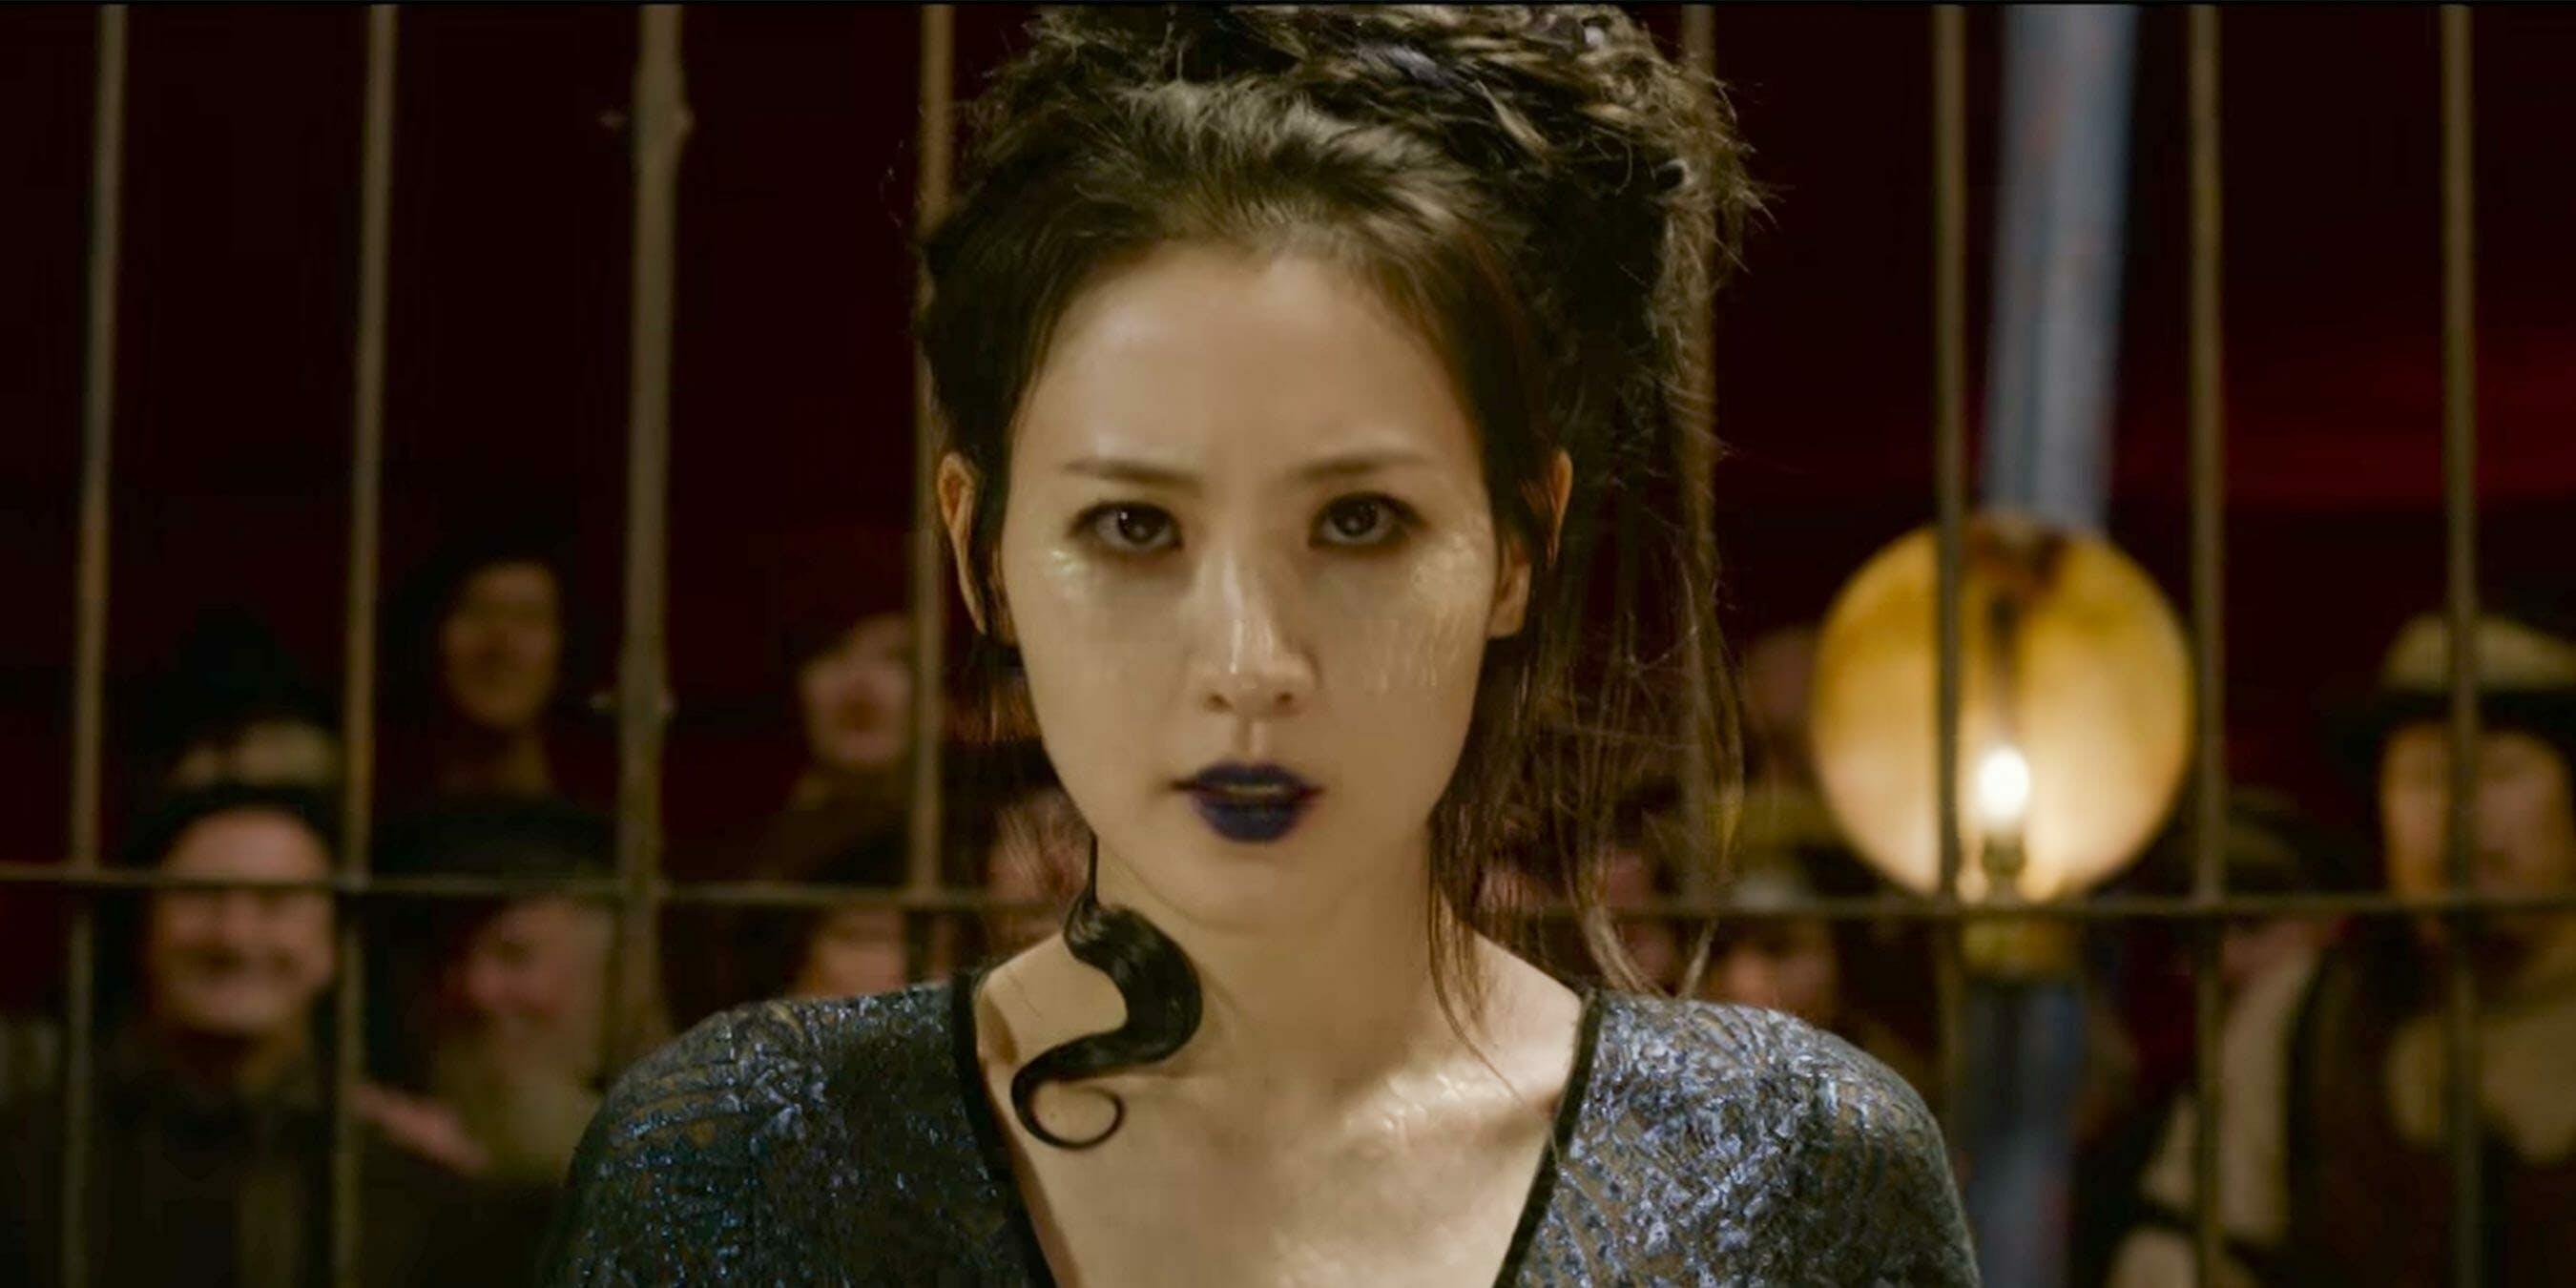 J.K. Rowling Criticized for Nagini's Racist Role in 'Fantastic Beasts'